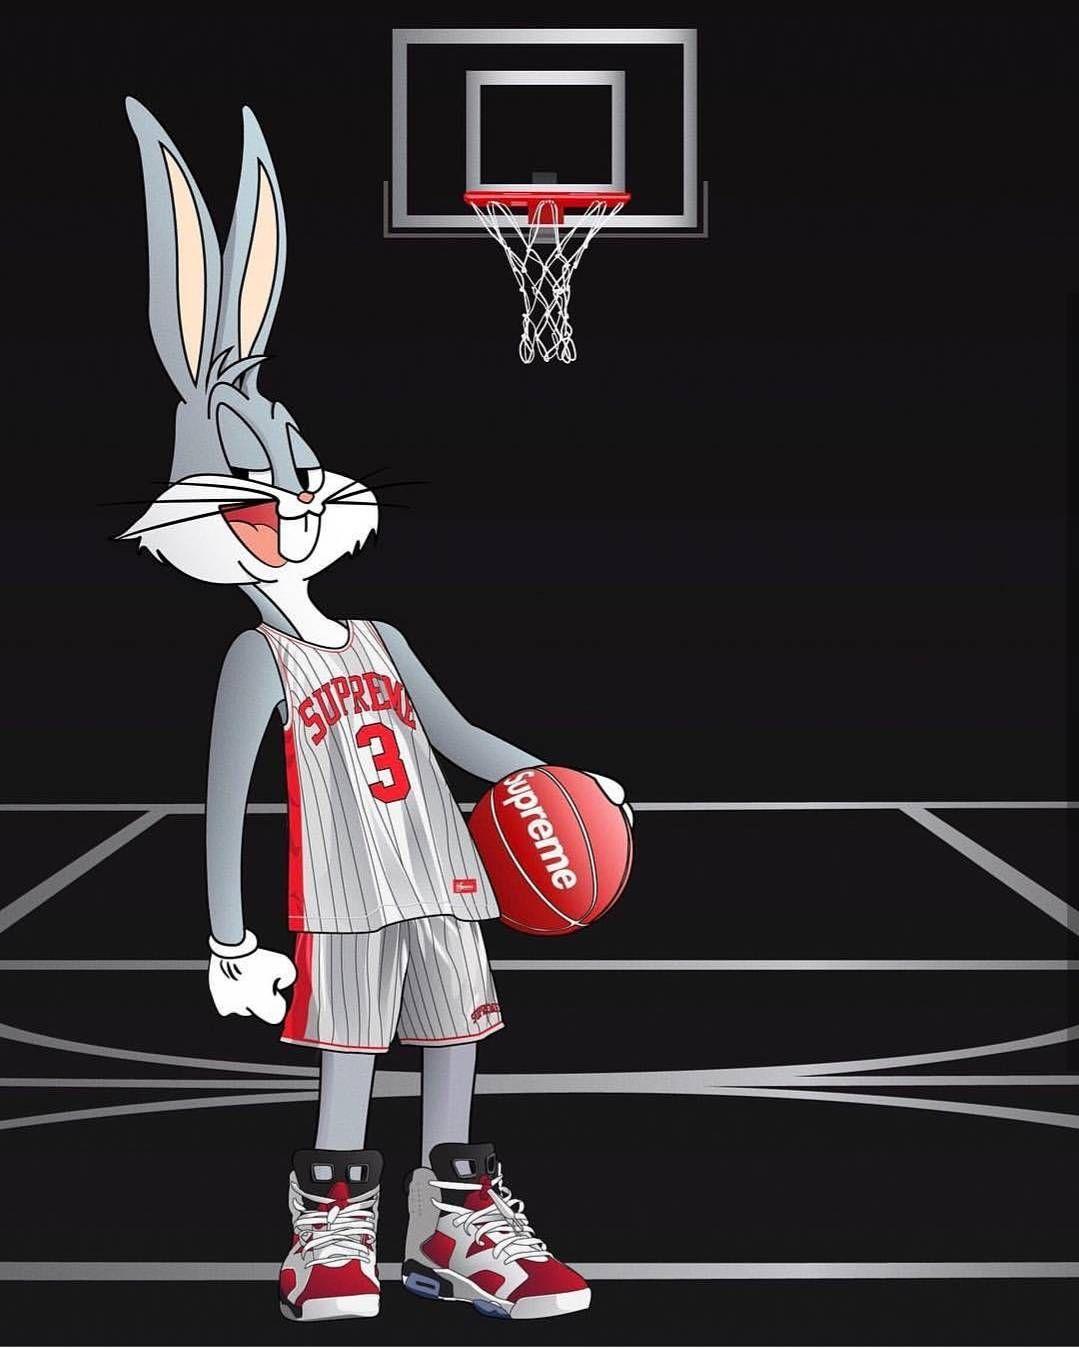 Pinterest Adc Cute Cartoon Wallpapers Supreme Wallpaper Bunny Wallpaper